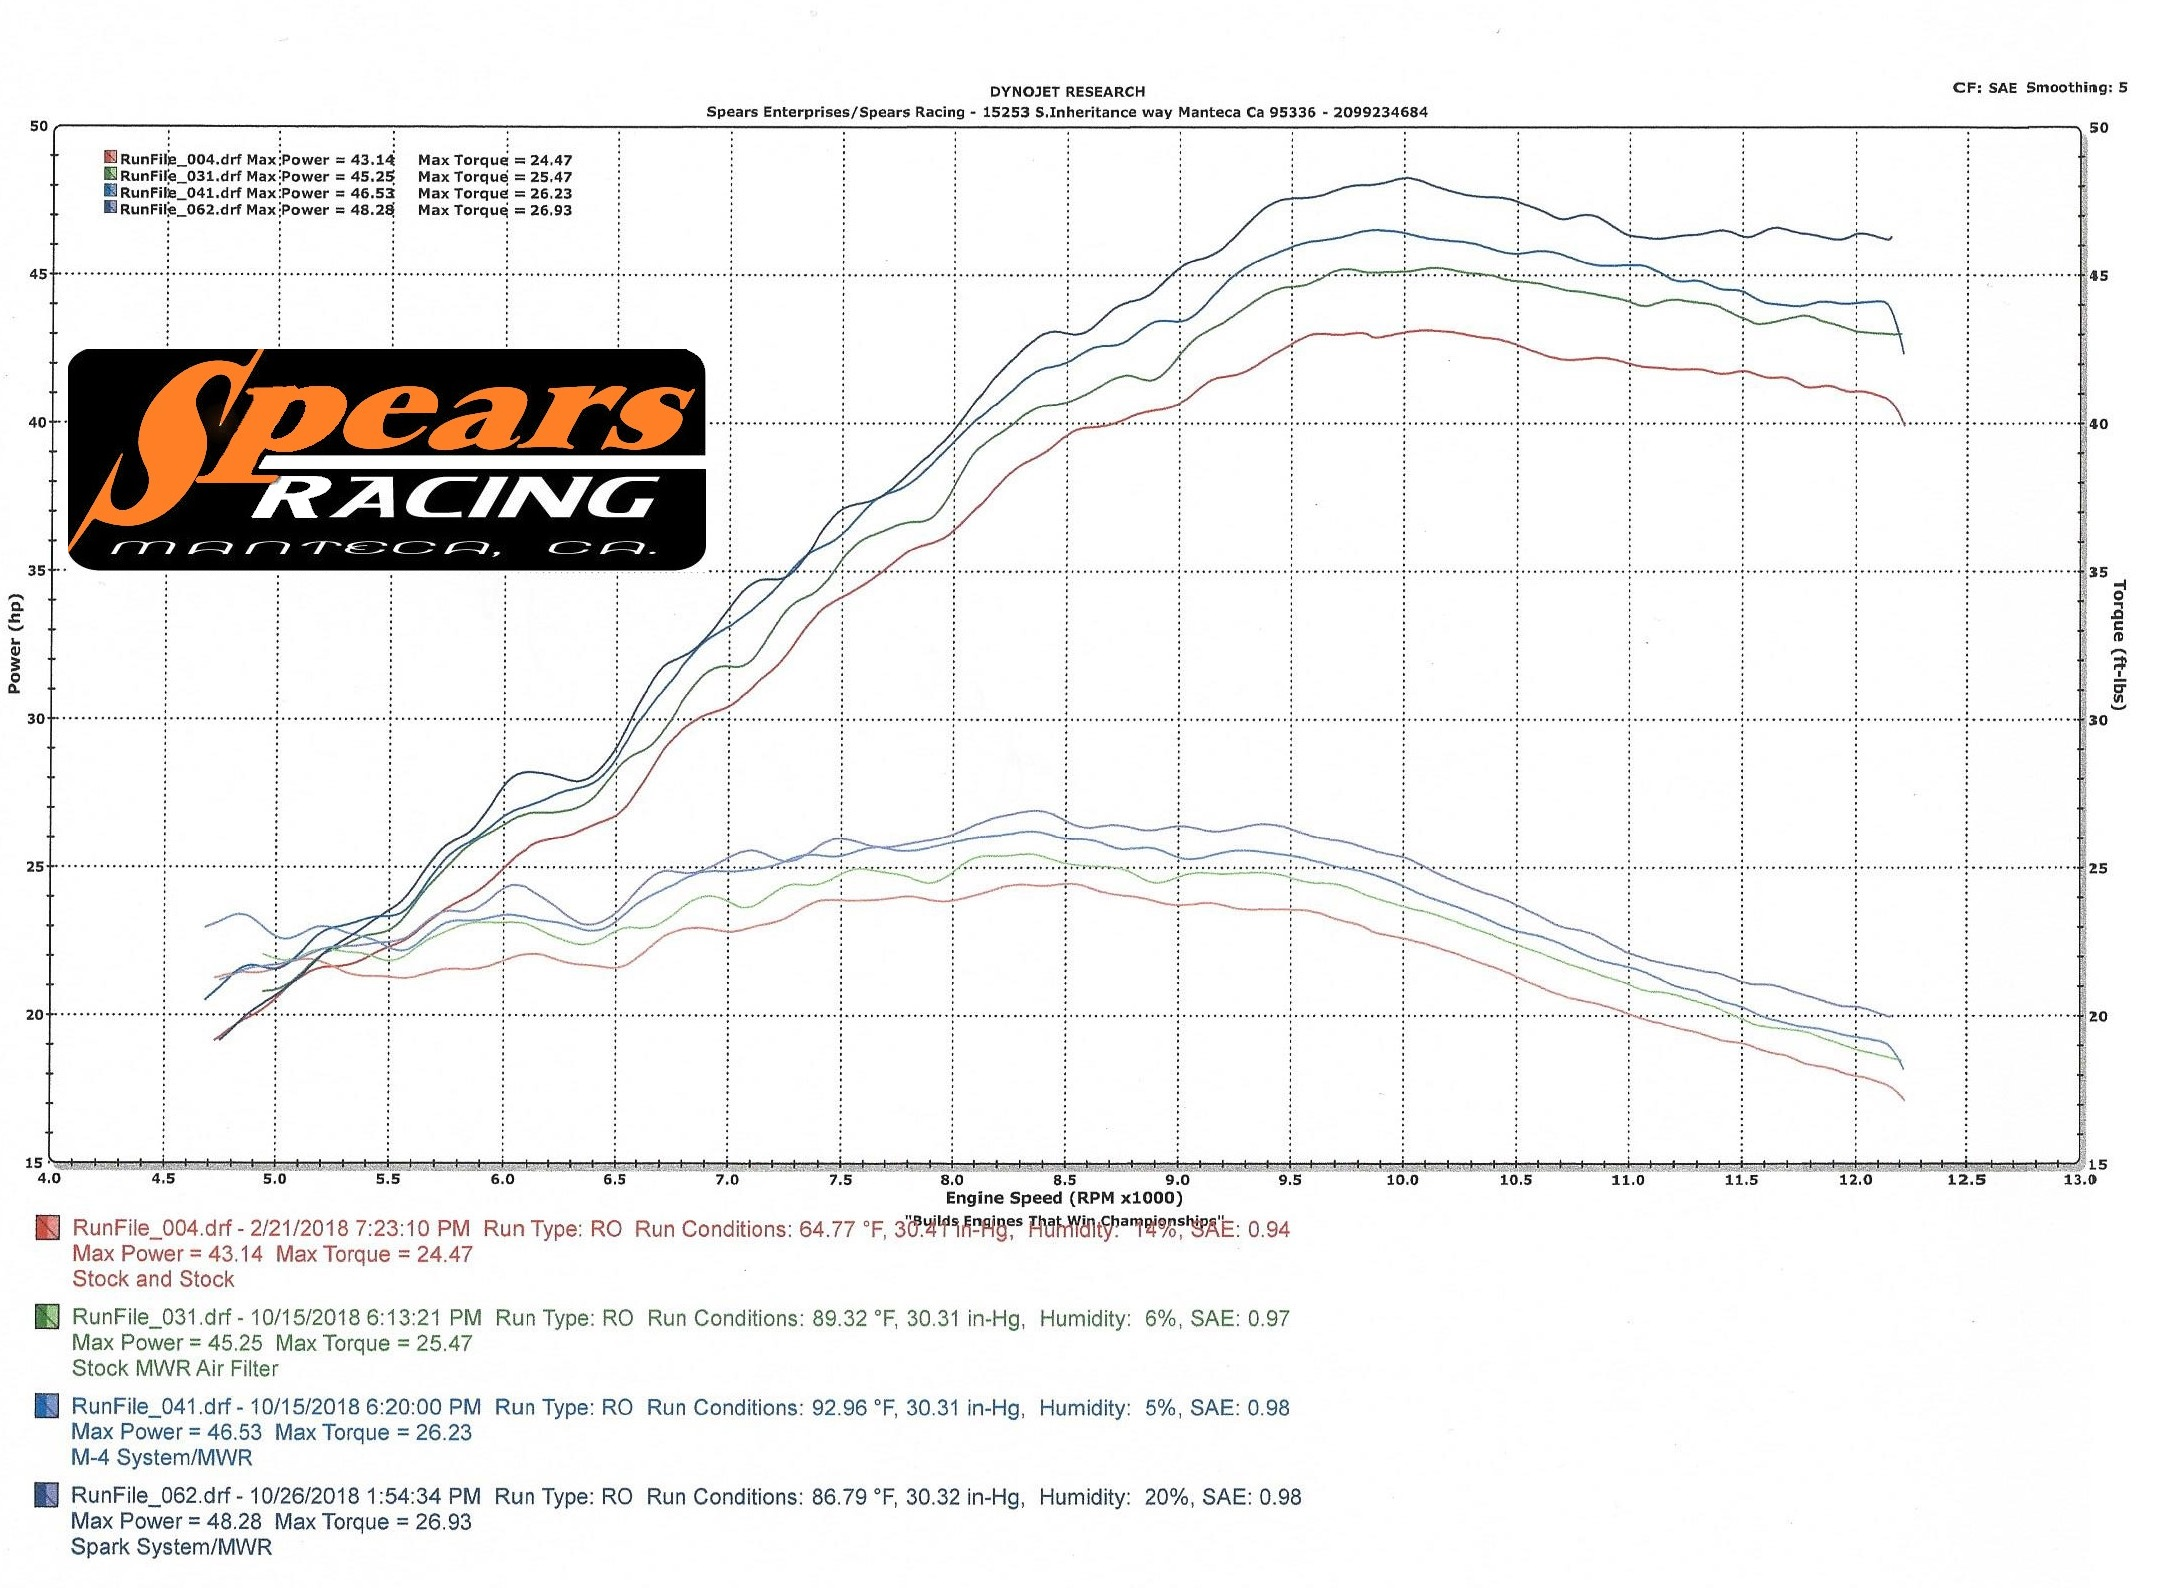 Kawasaki Ninja Ex400cc Compared To Stock With M 4 Exhaust